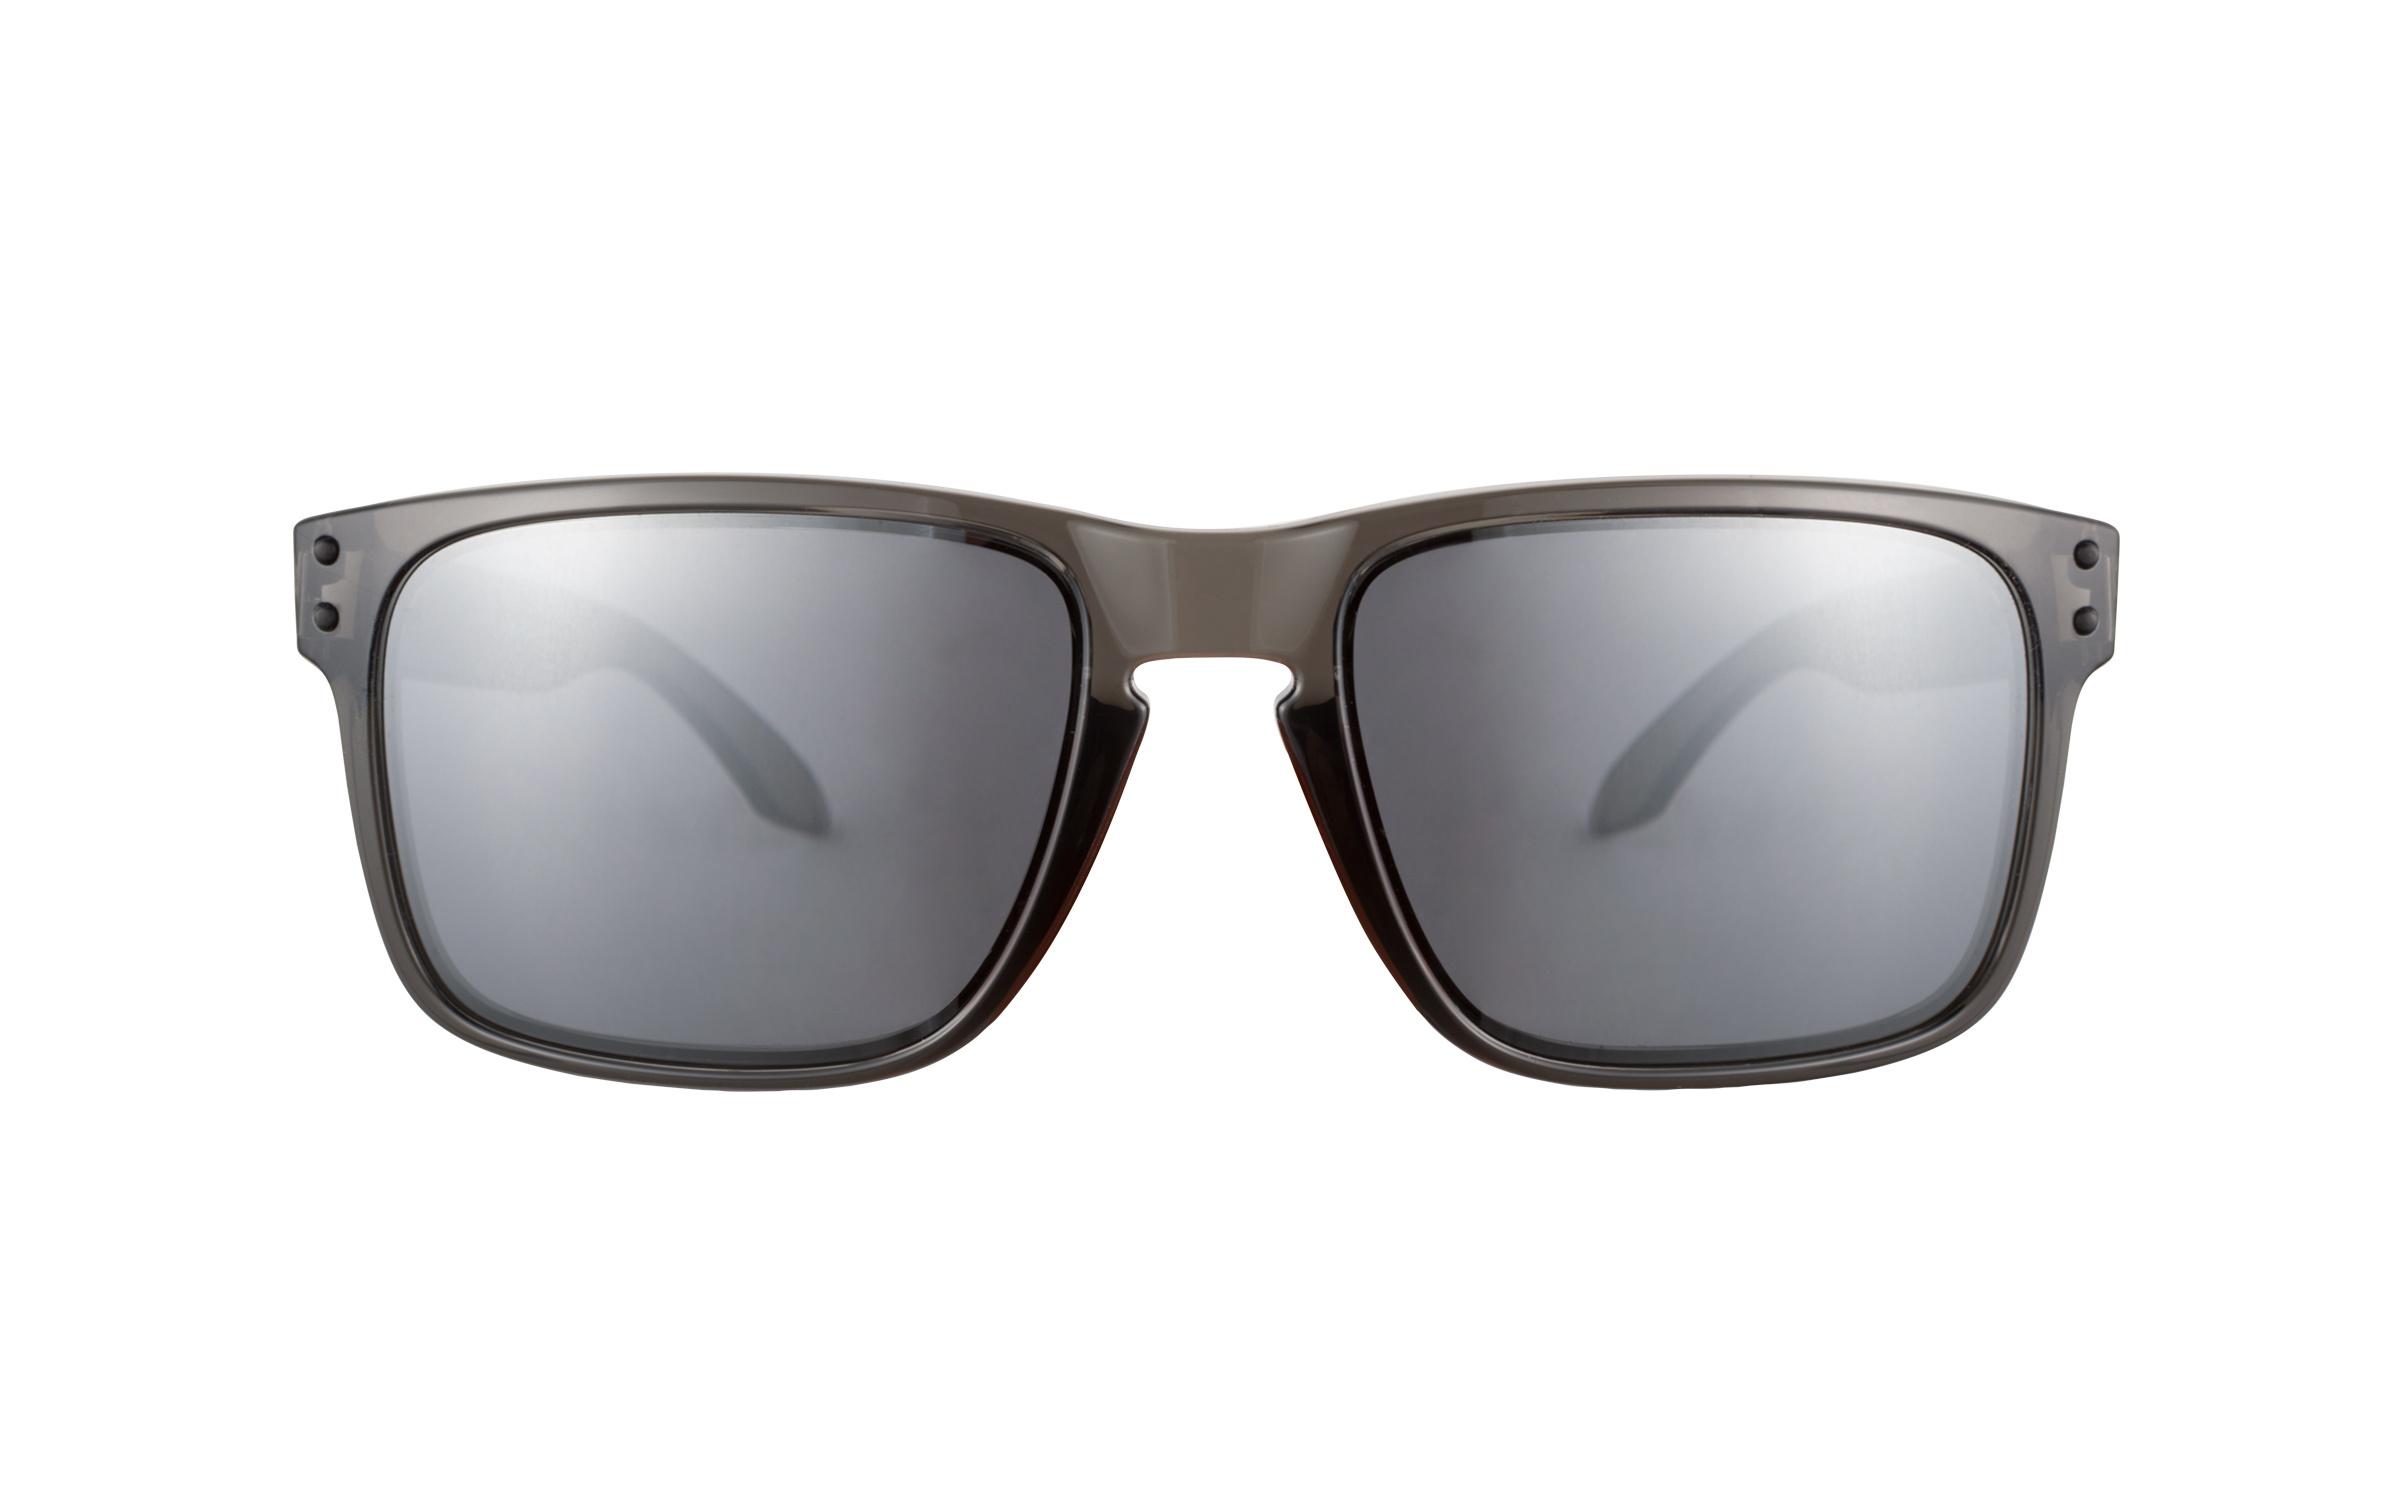 oakley sunglasses oo9102 holbrook ulyg  product image of Oakley Holbrook Grey Smoke